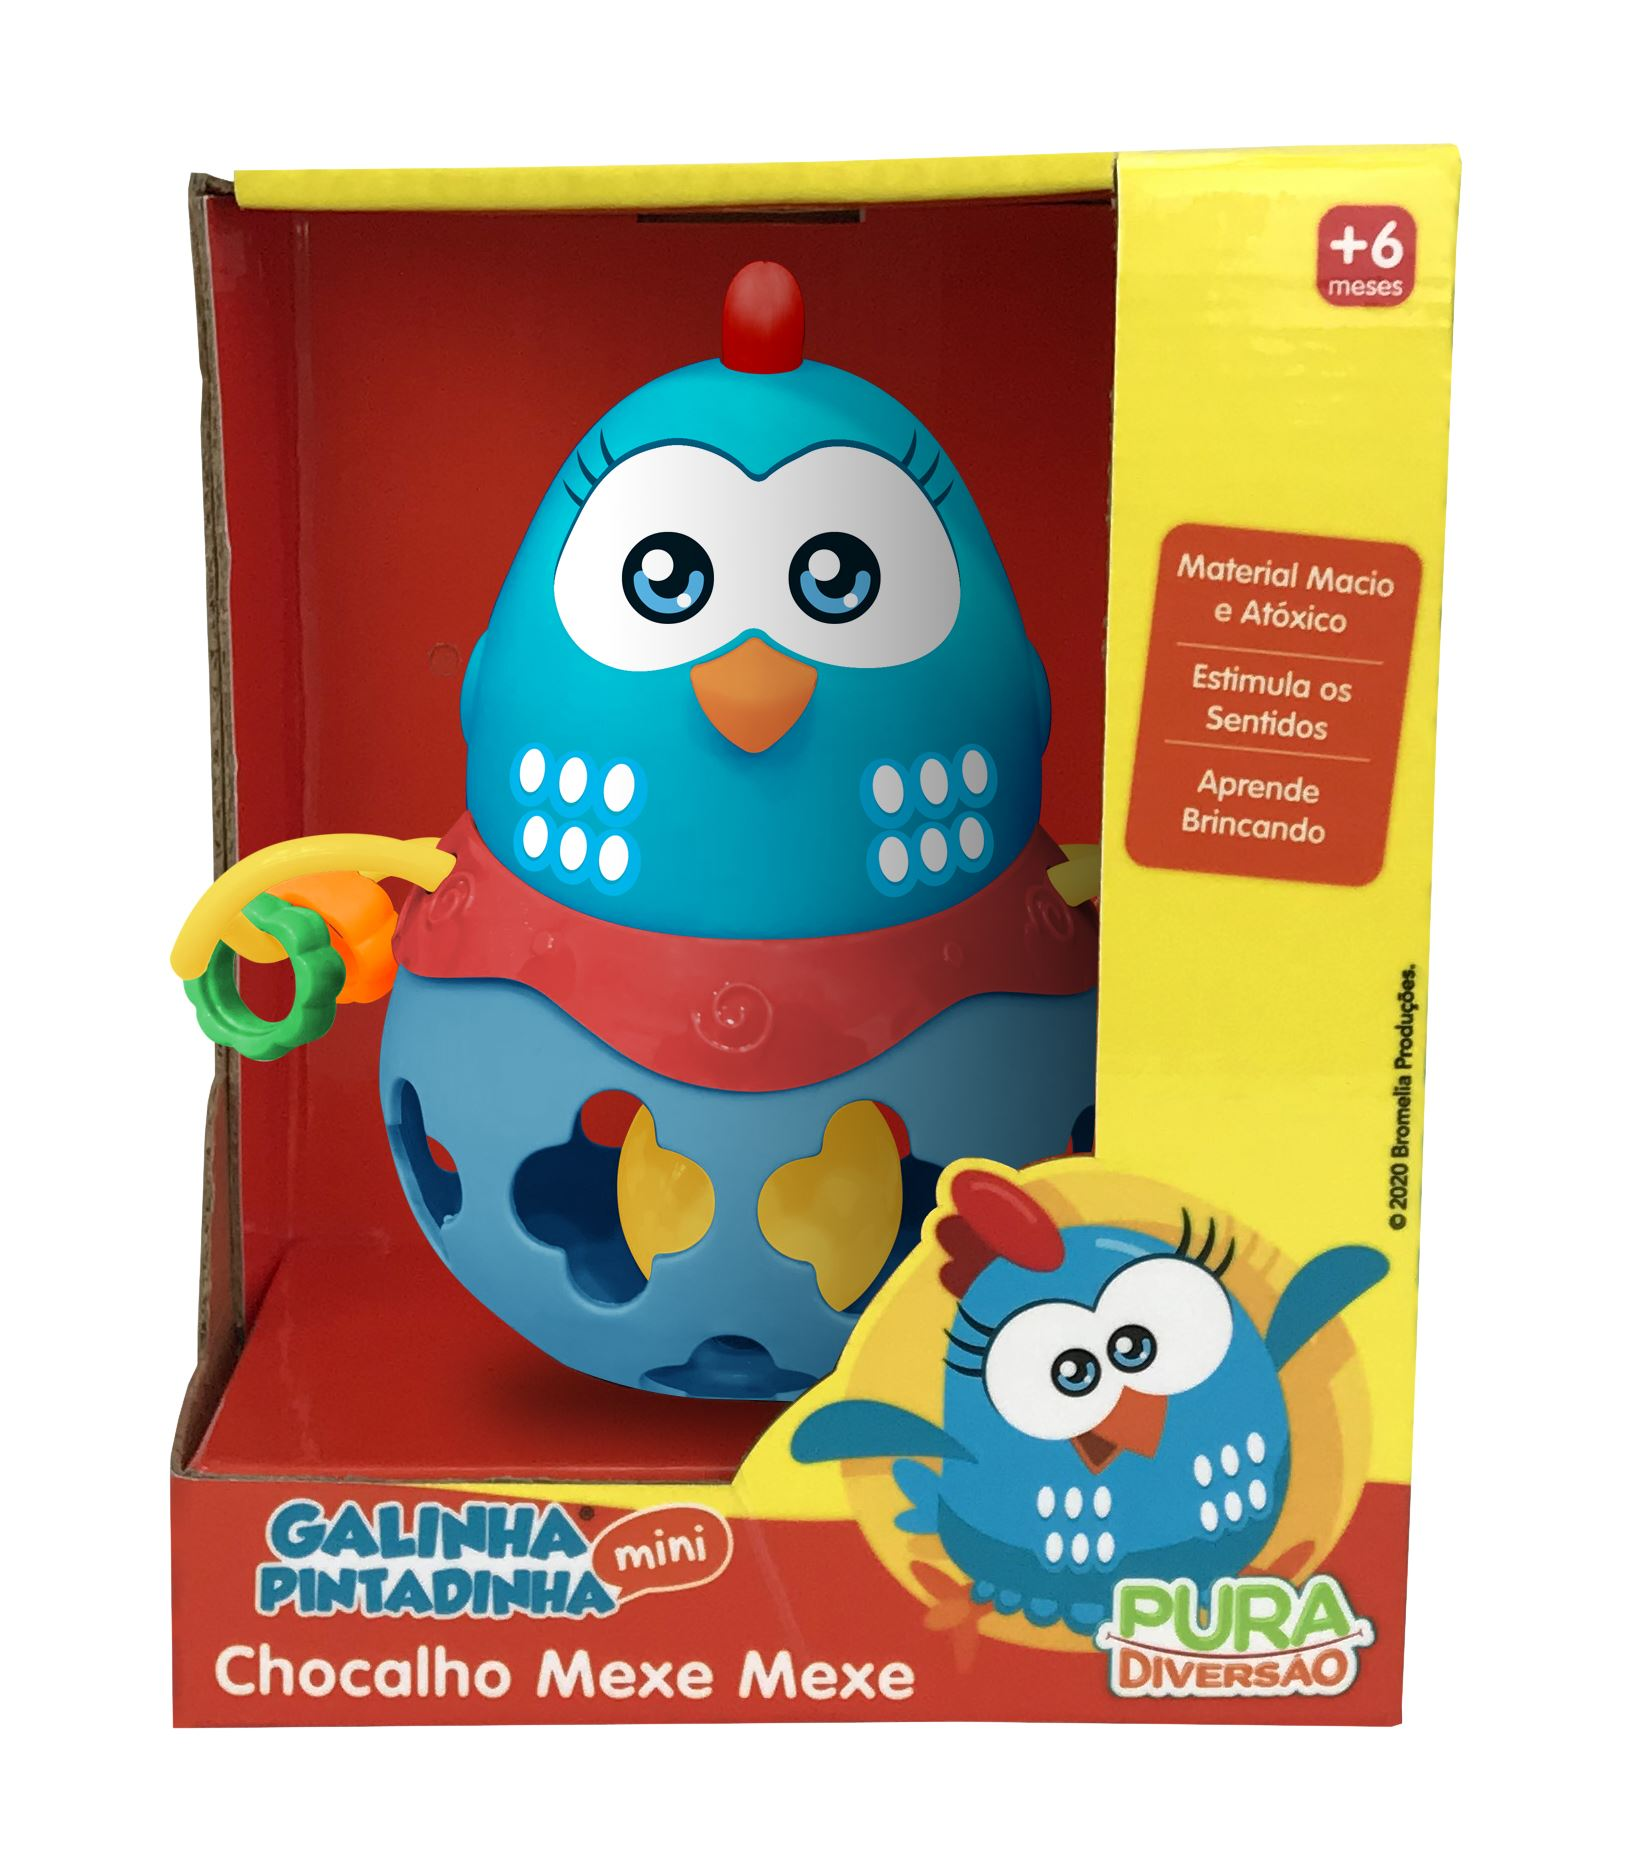 Chocalho Mexe Mexe - Galinha Pintadinha - Yes Toys